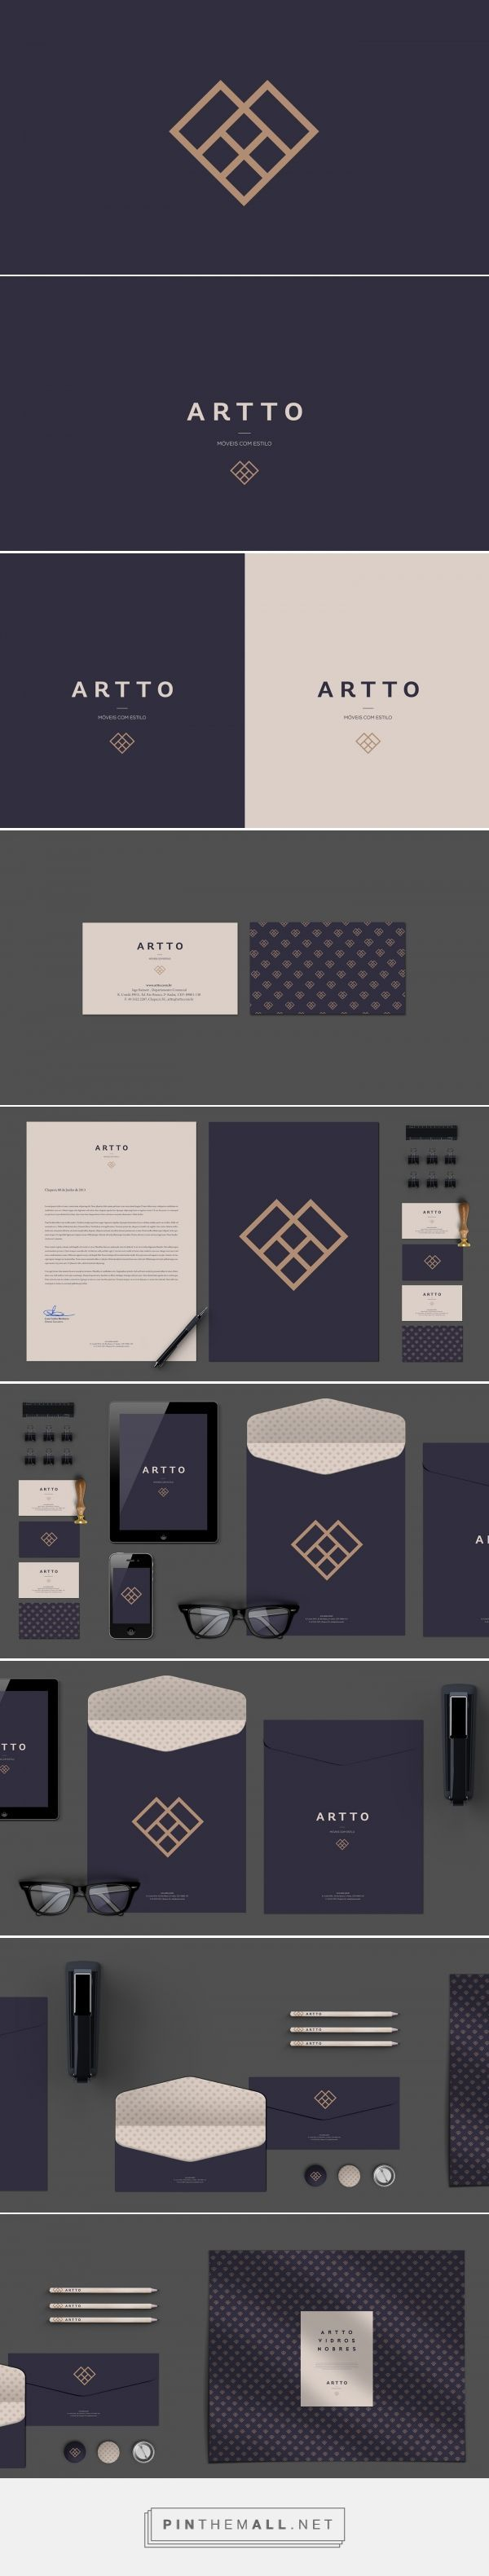 Artto Móveis com estilo Branding by Estudio Alice | Fivestar Branding Agency – Design and Branding Agency & Curated Inspiration Gallery